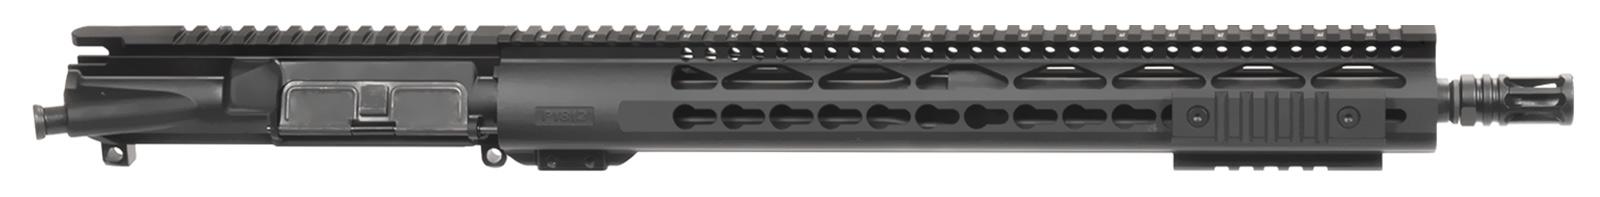 ar-15-upper-assembly-16-multiple-calibers-15-cbc-keymod-tri-ar-15-handguard-rail